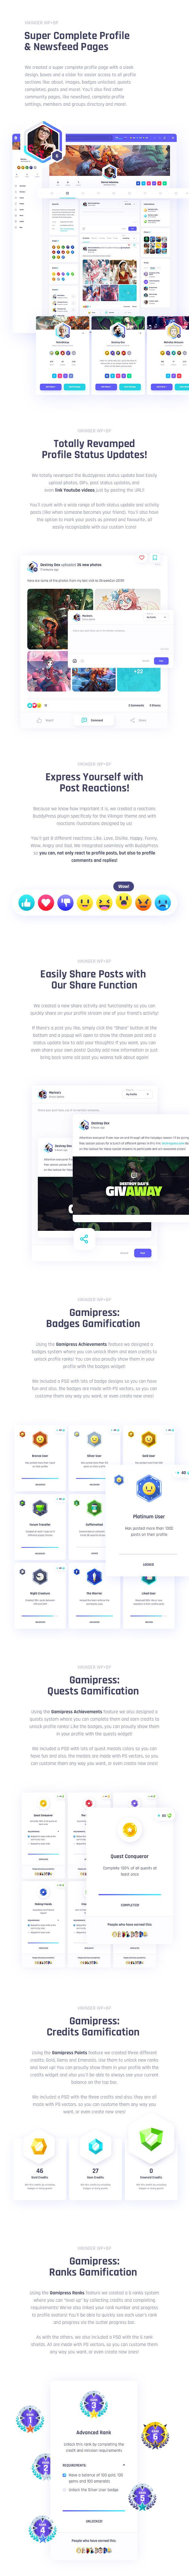 Vikinger - BuddyPress and GamiPress Social Community - 16